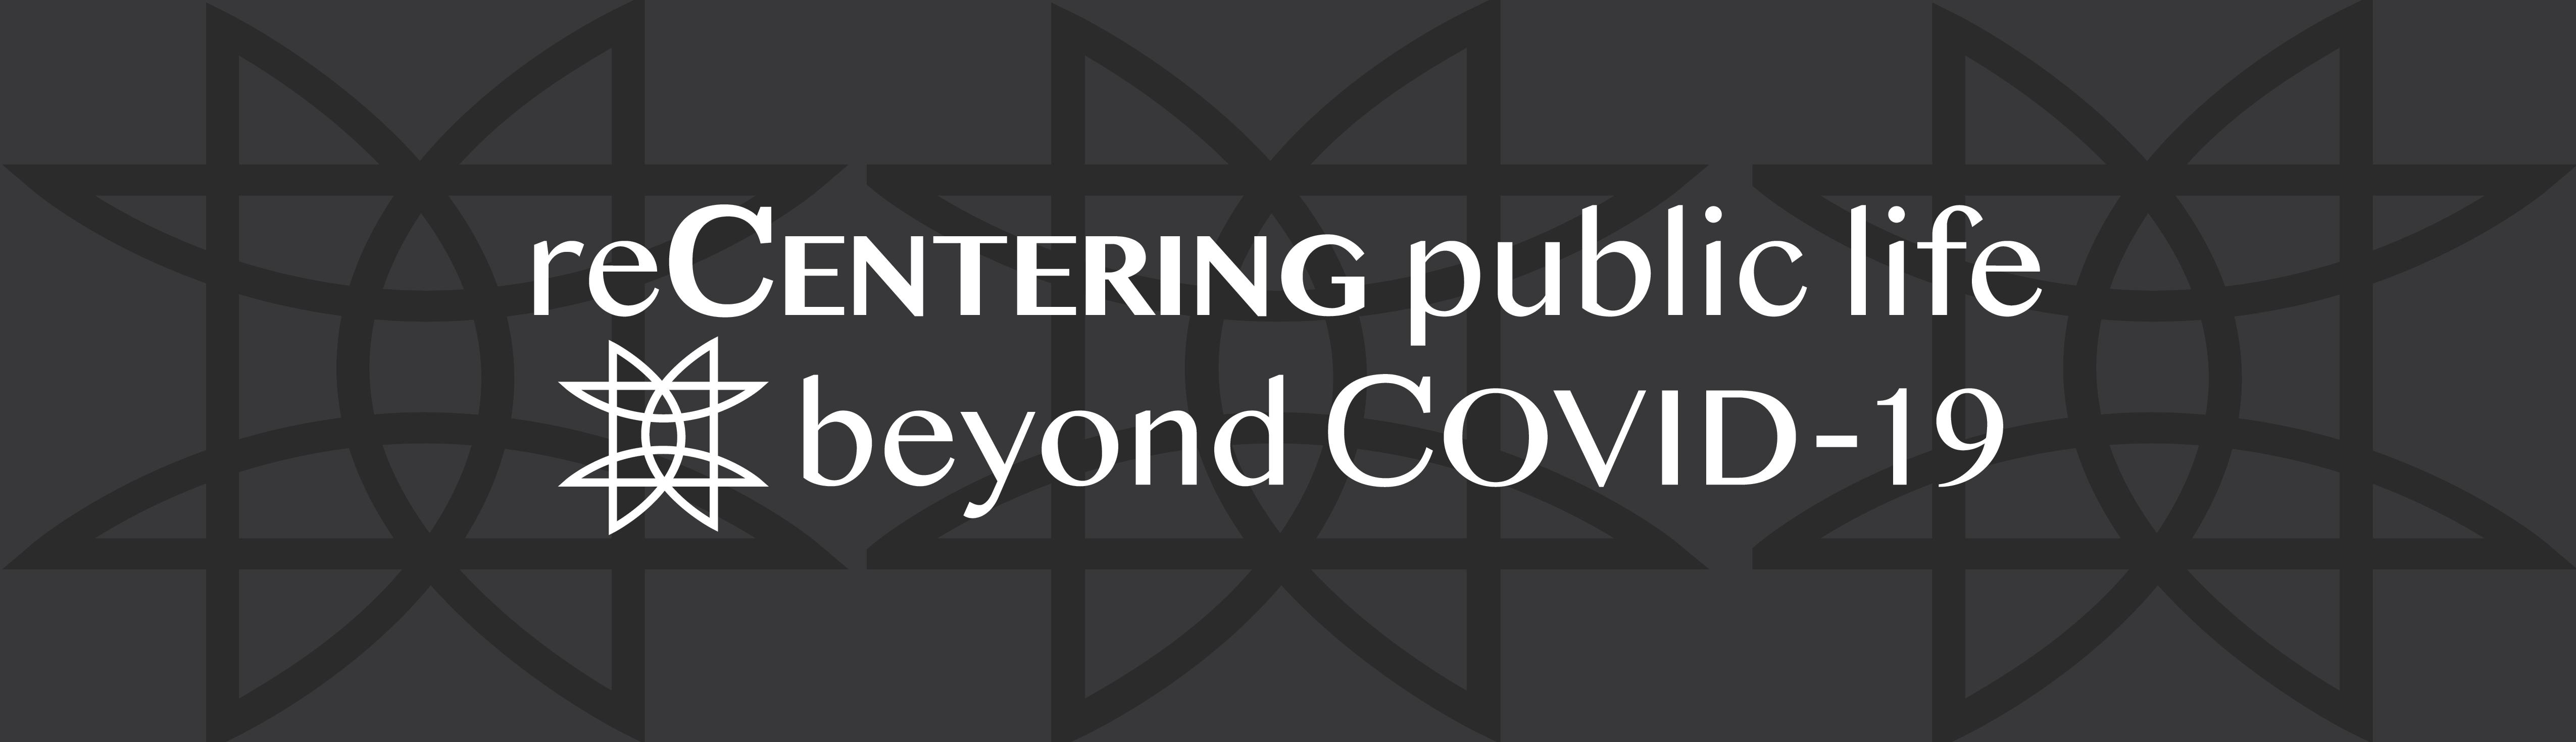 reCentering Public Life beyond COVID-19 graphic